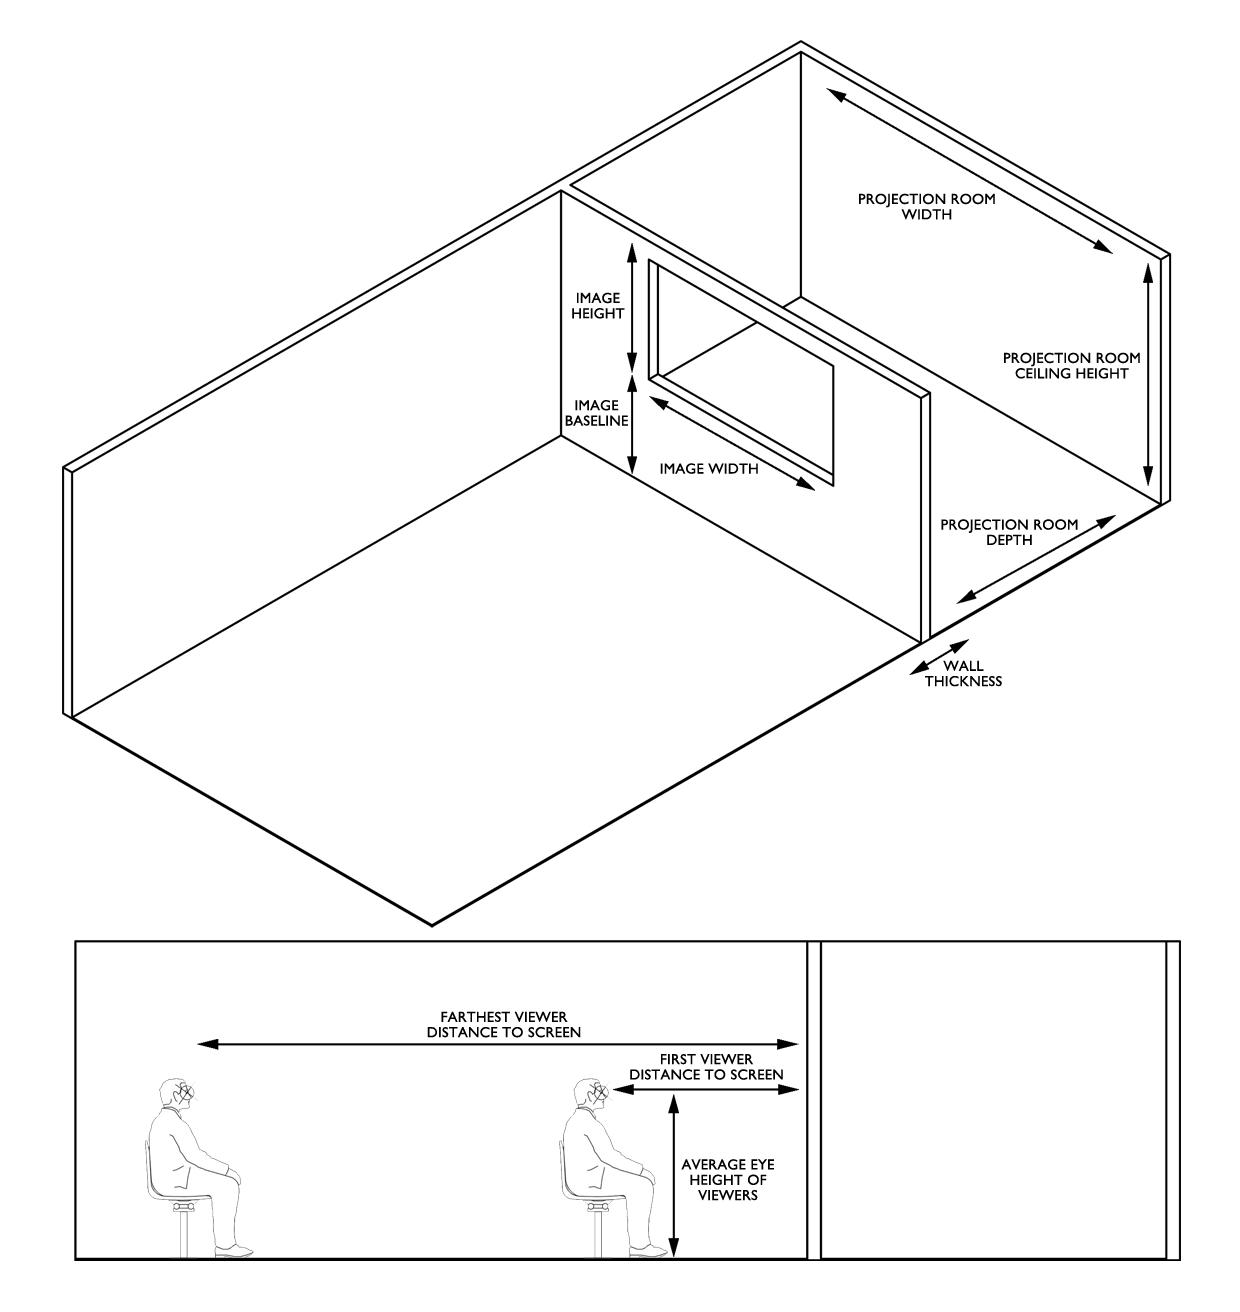 Rear projection system depth diagram